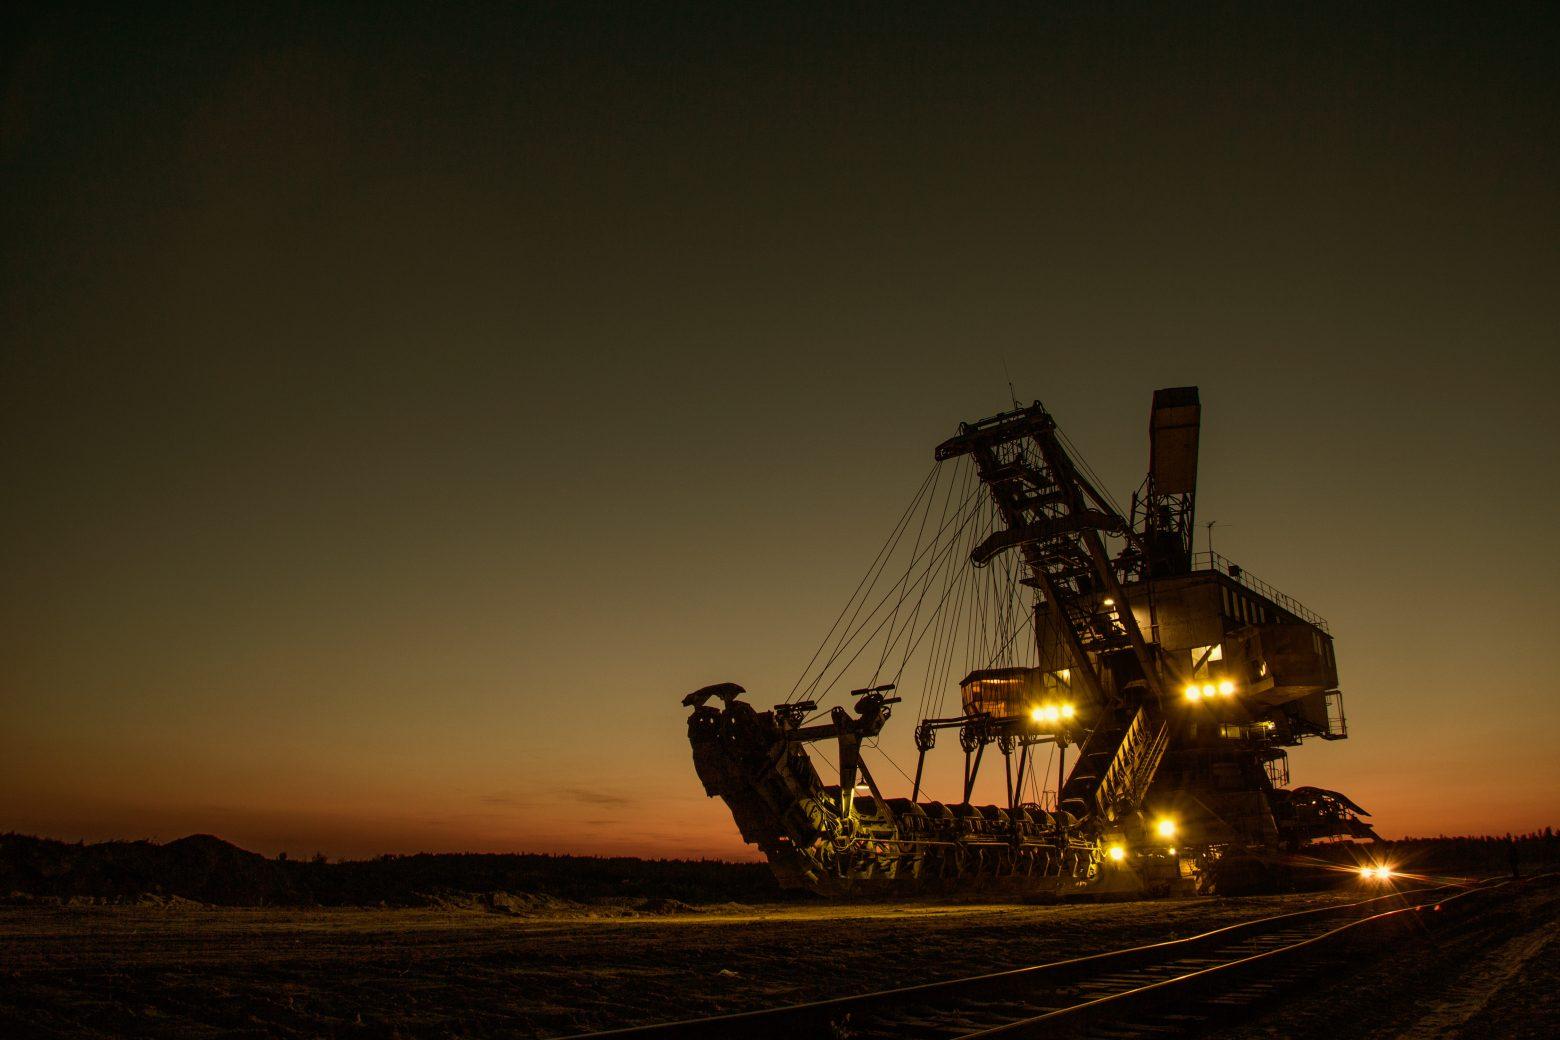 mining-excavator-1736289